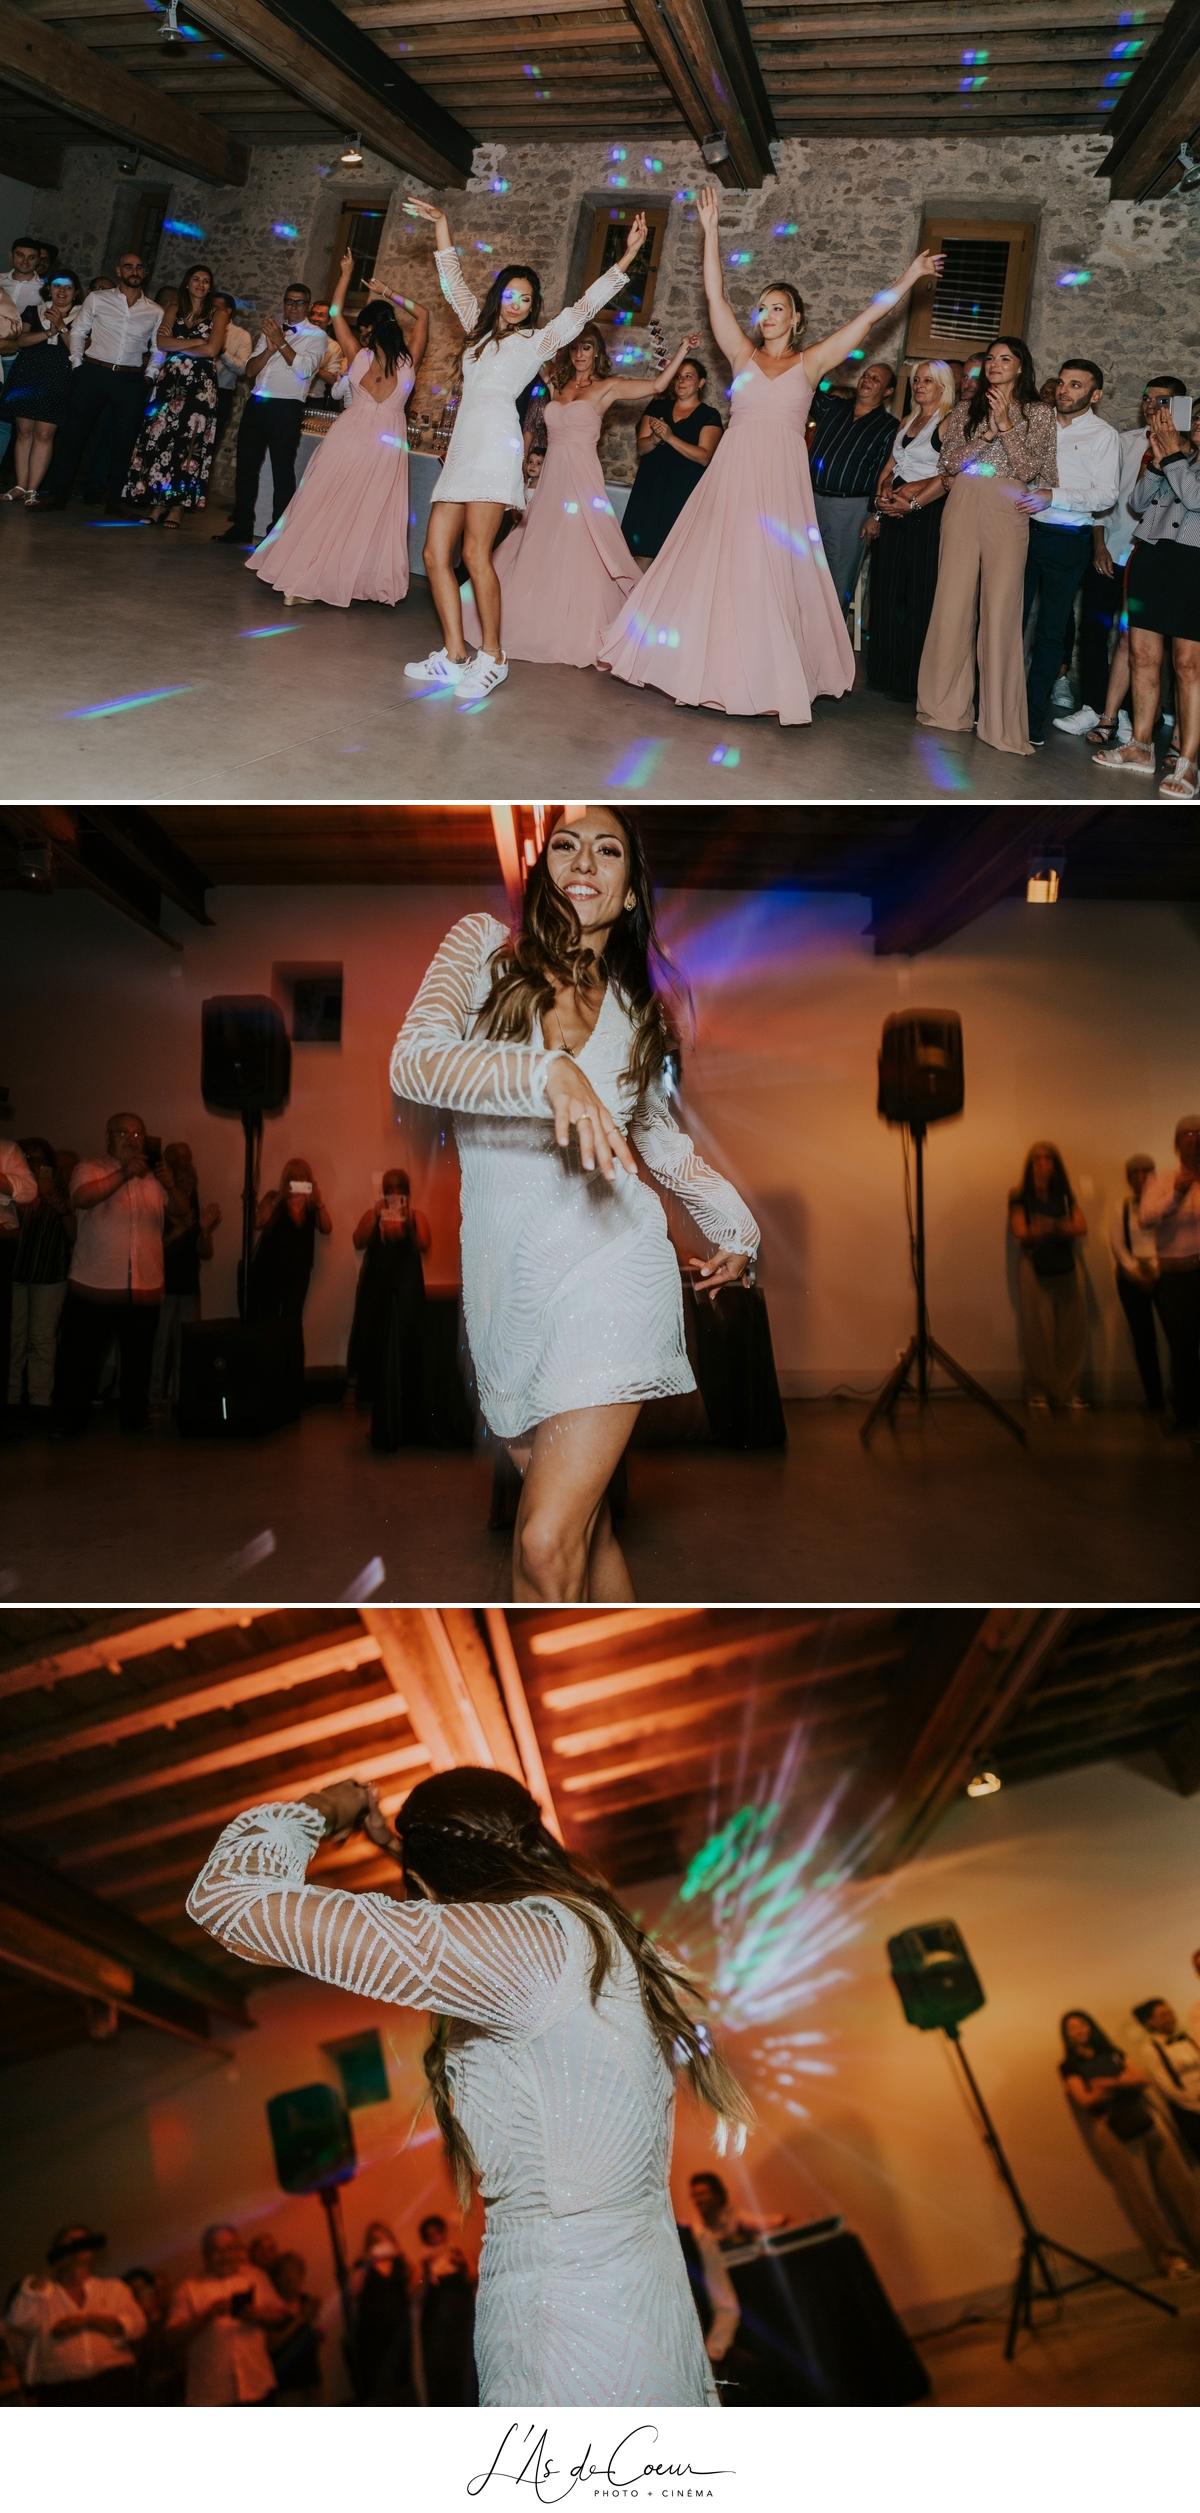 danse sexy Mariage bohème château de la Gallée photographe Mariage Lyon ©lasdecoeur